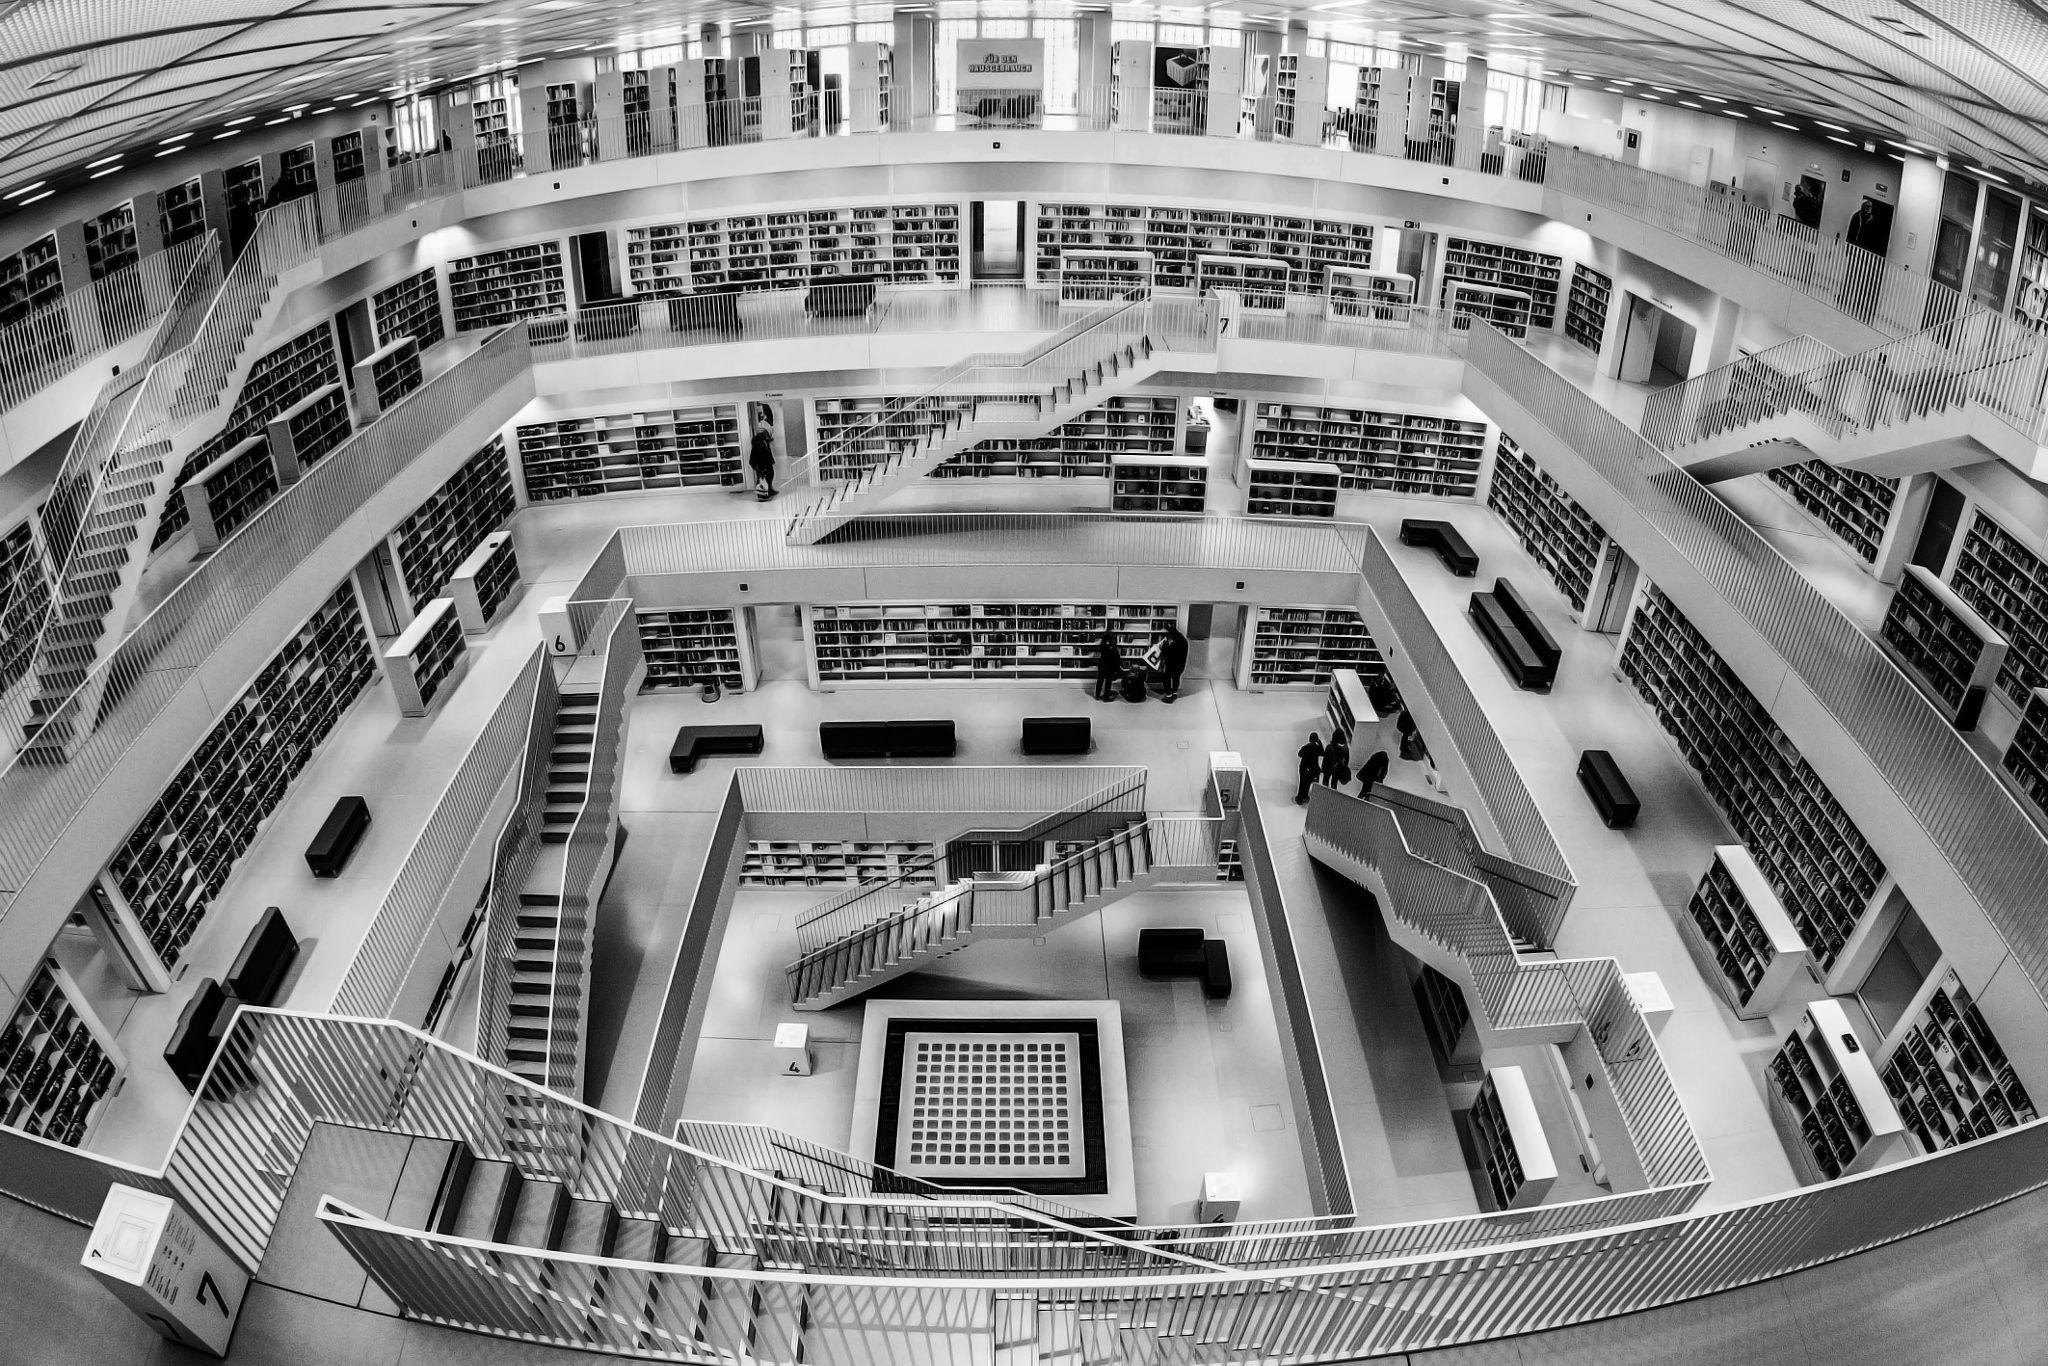 "Stuttgart City Library - The Stadtbibliothek Stuttgart is the public library of the city of Stuttgart.  Follow me on: <a href=""https://www.facebook.com/cyberstudioinfo"">FACEBOOK</a>    <a href=""https://www.instagram.com/atanasov7"">INSTAGRAM</a>  "